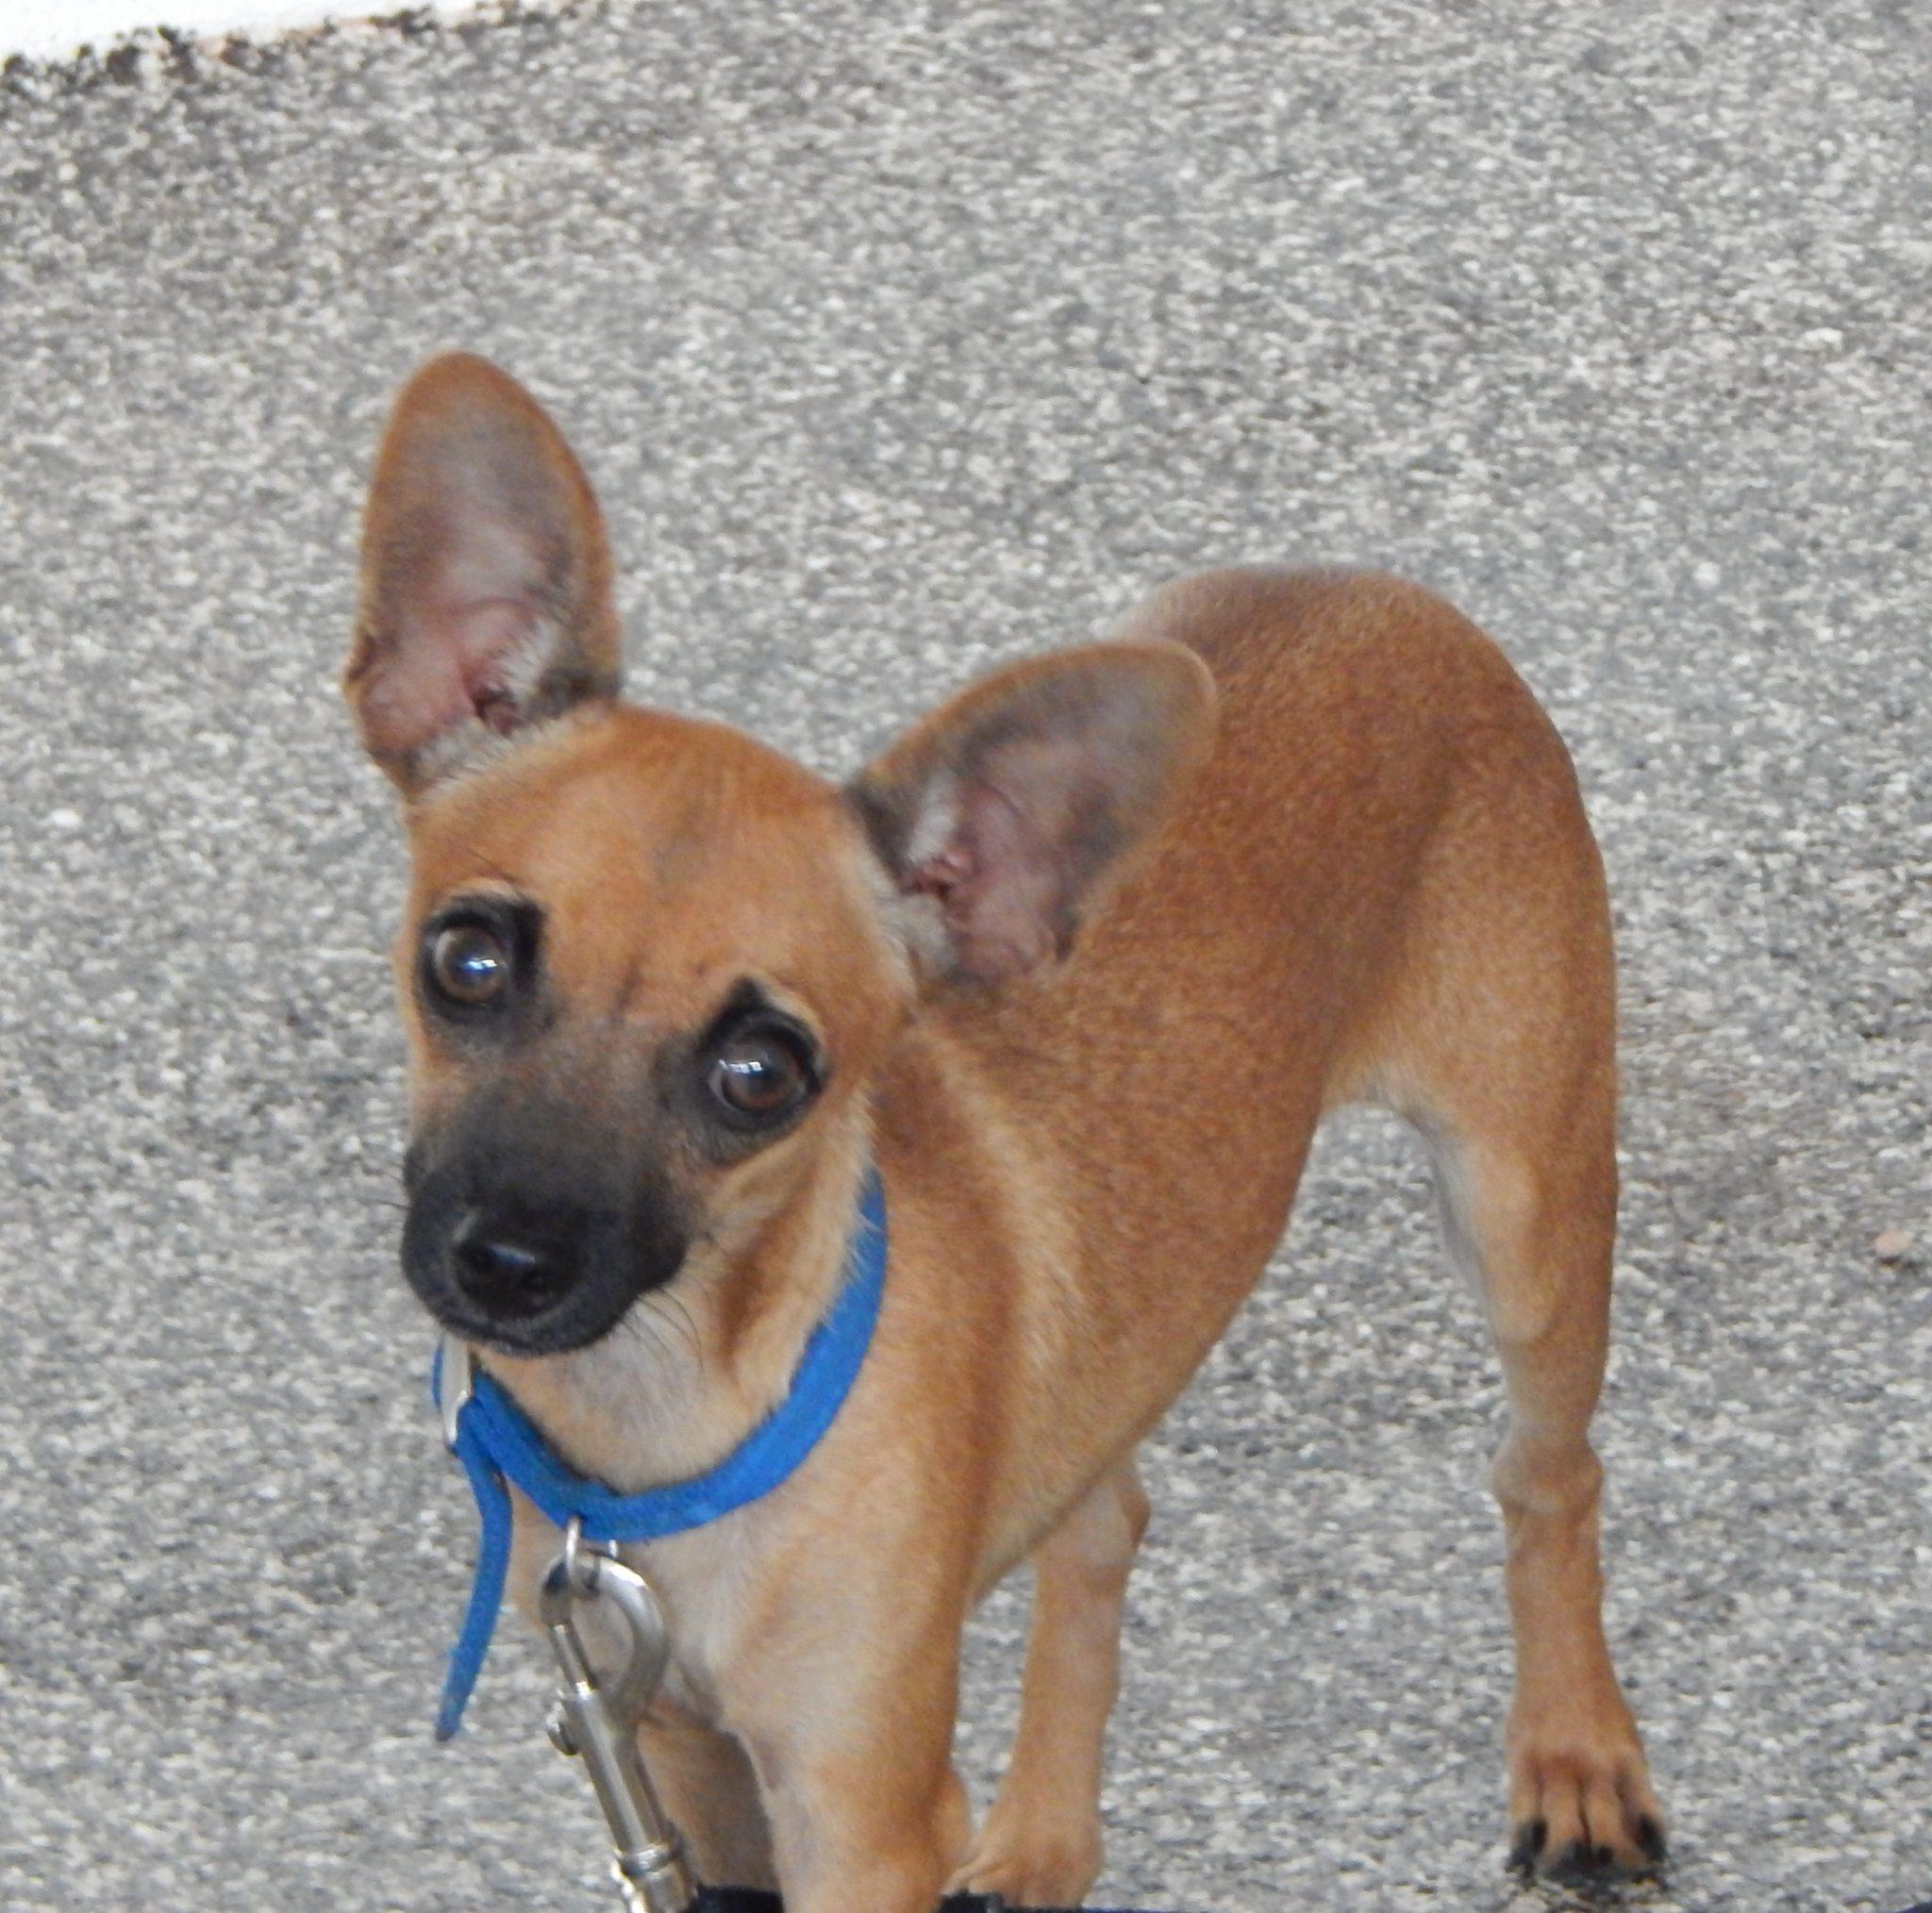 Mesquite Animal Shelter Pet Listing August 11, 2017